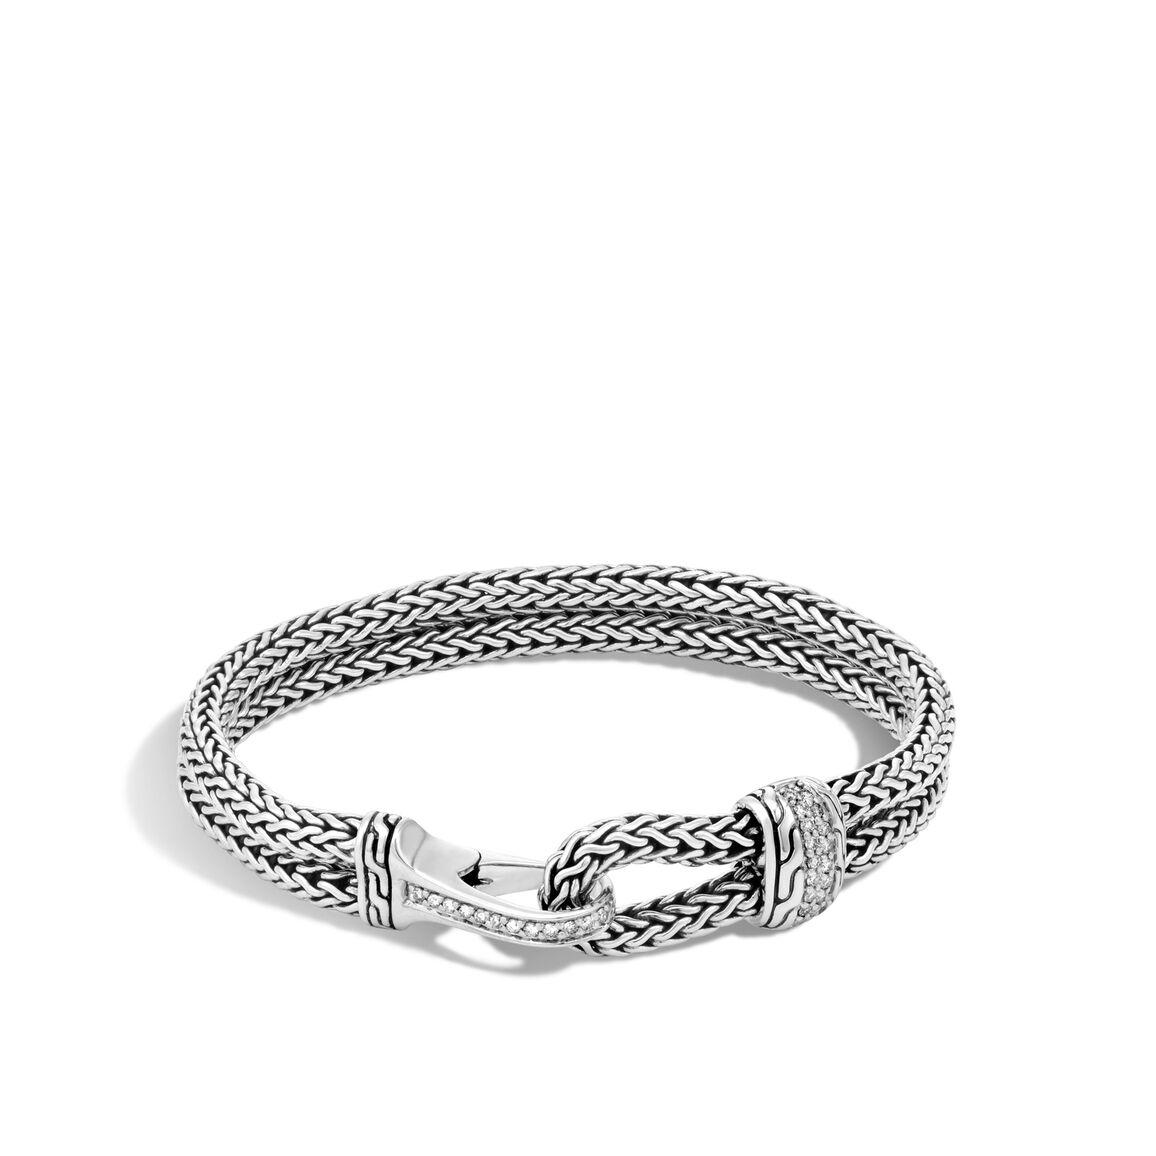 Classic Chain 9mm Station Bracelet, Silver, Gemstone